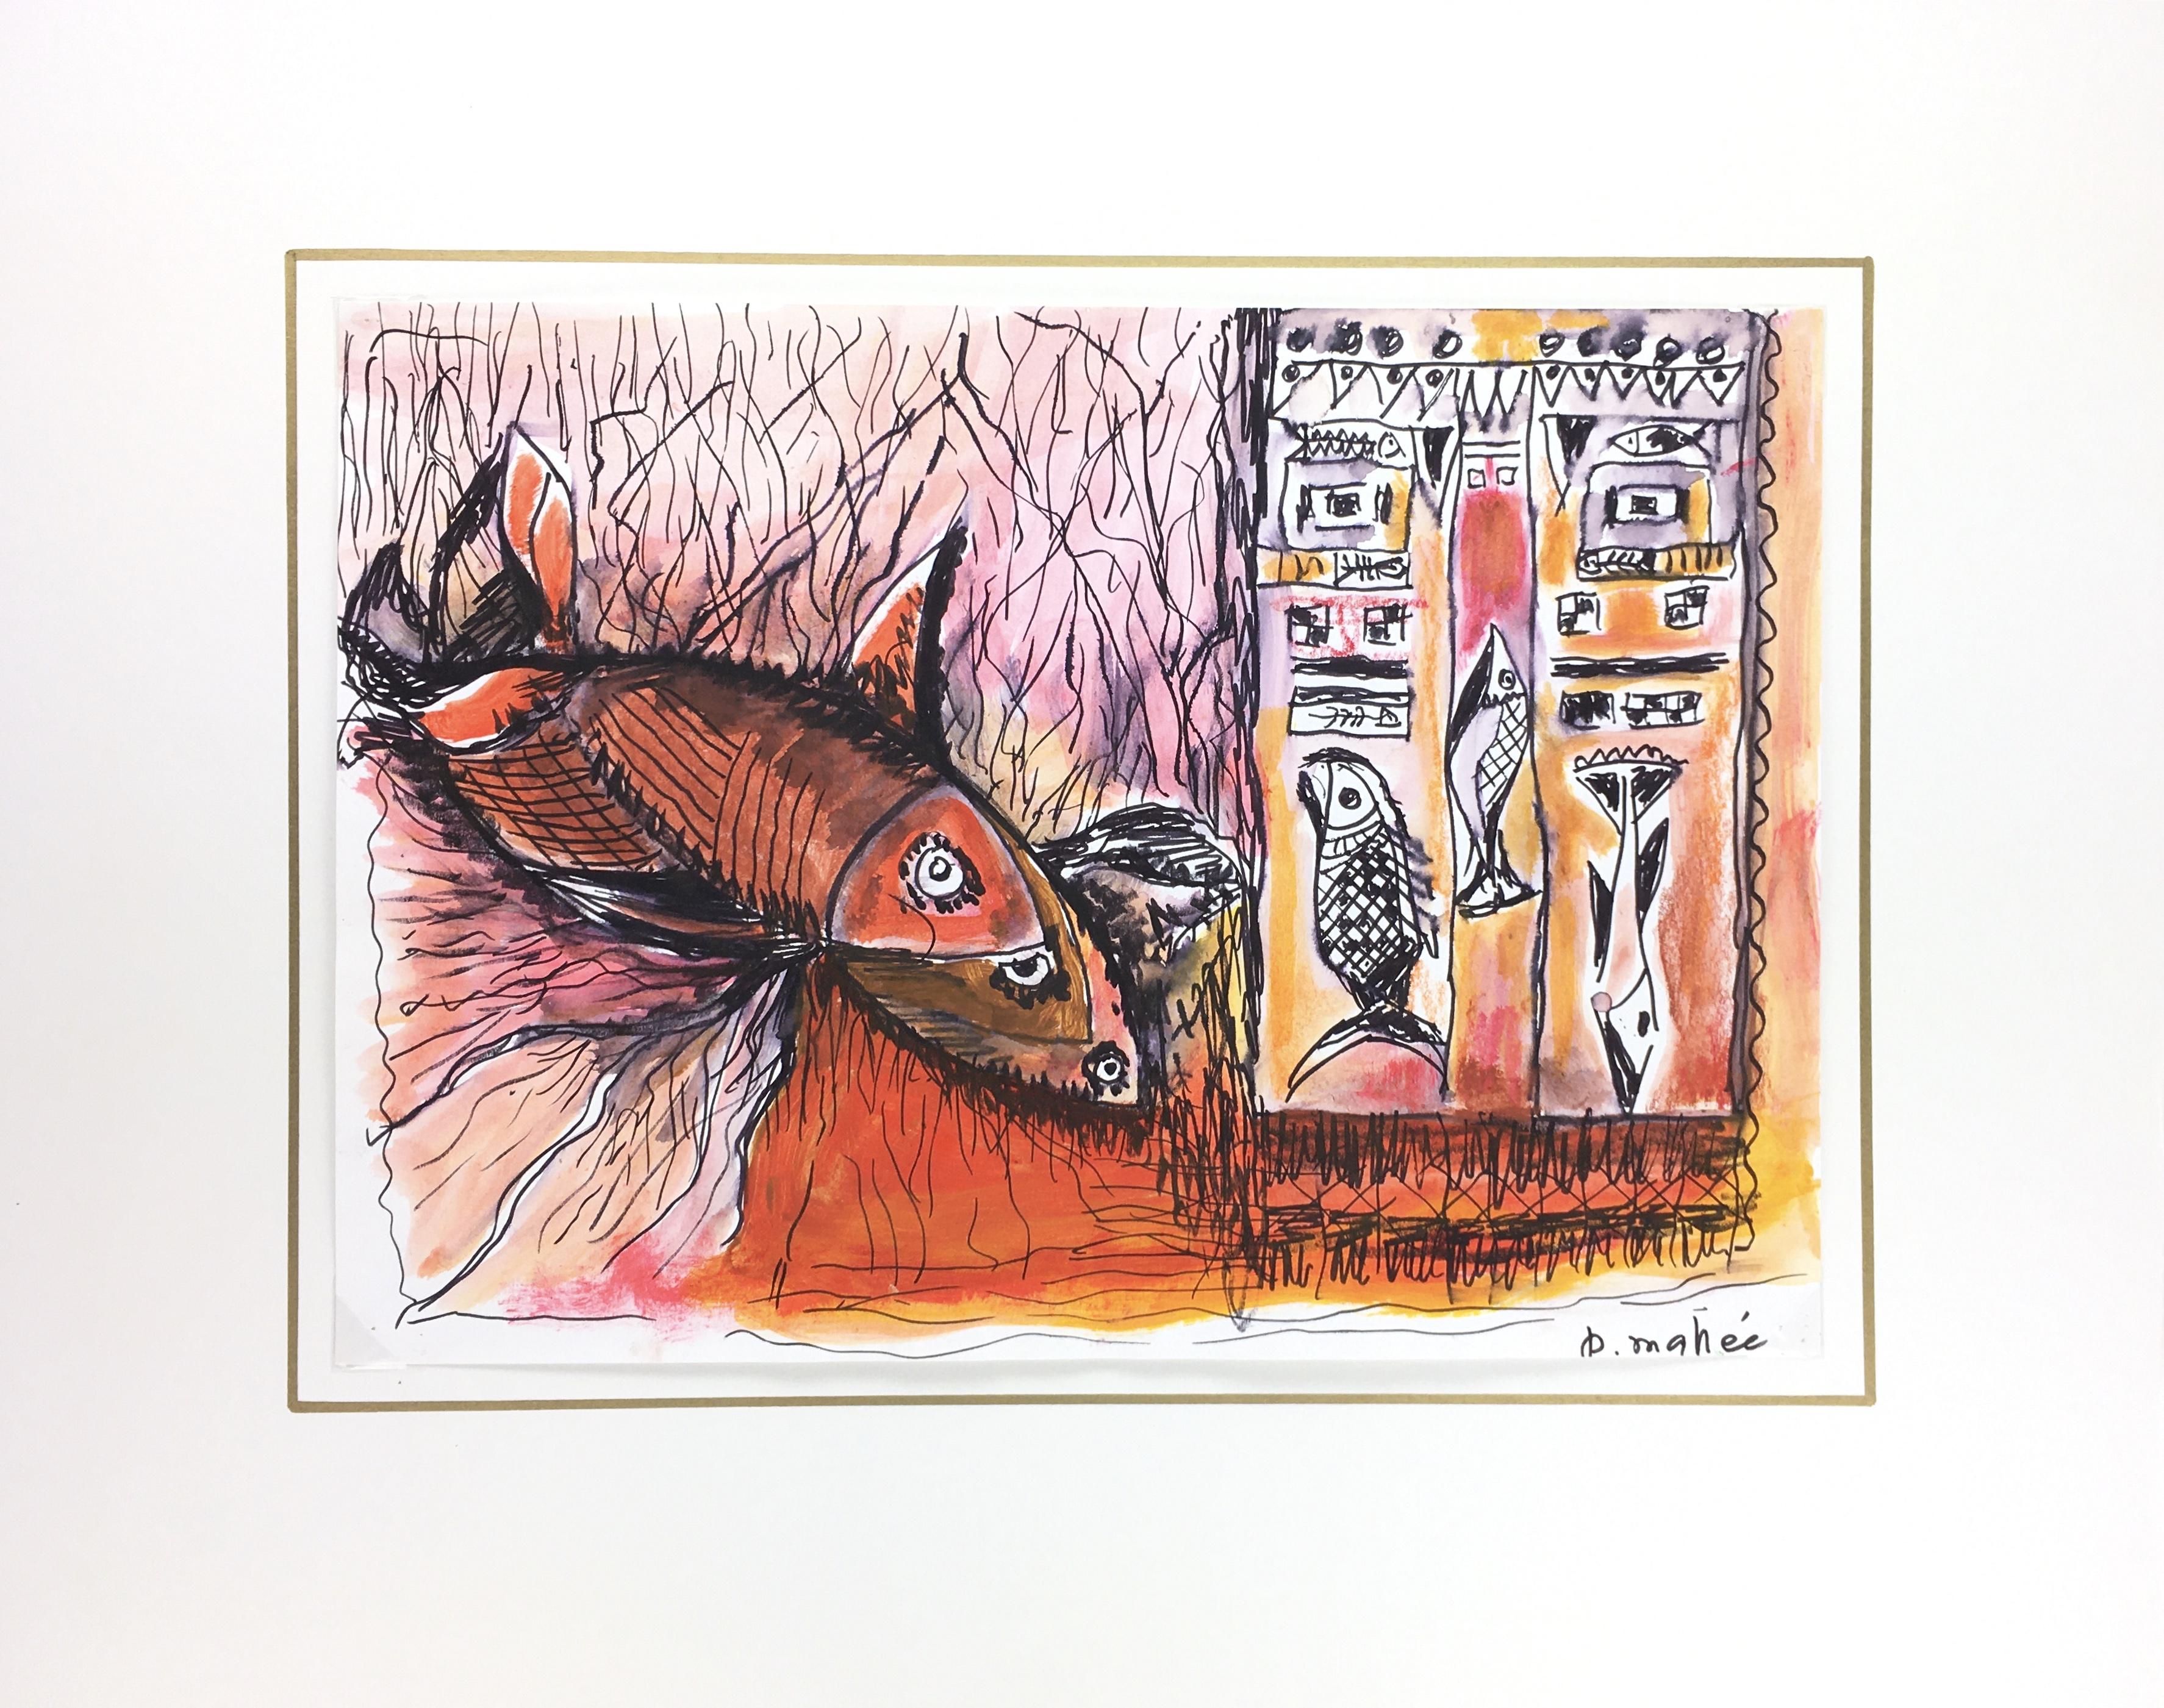 Animals Fish & Fishing Original Art - Fish, Modern, P. Mahee, 2000